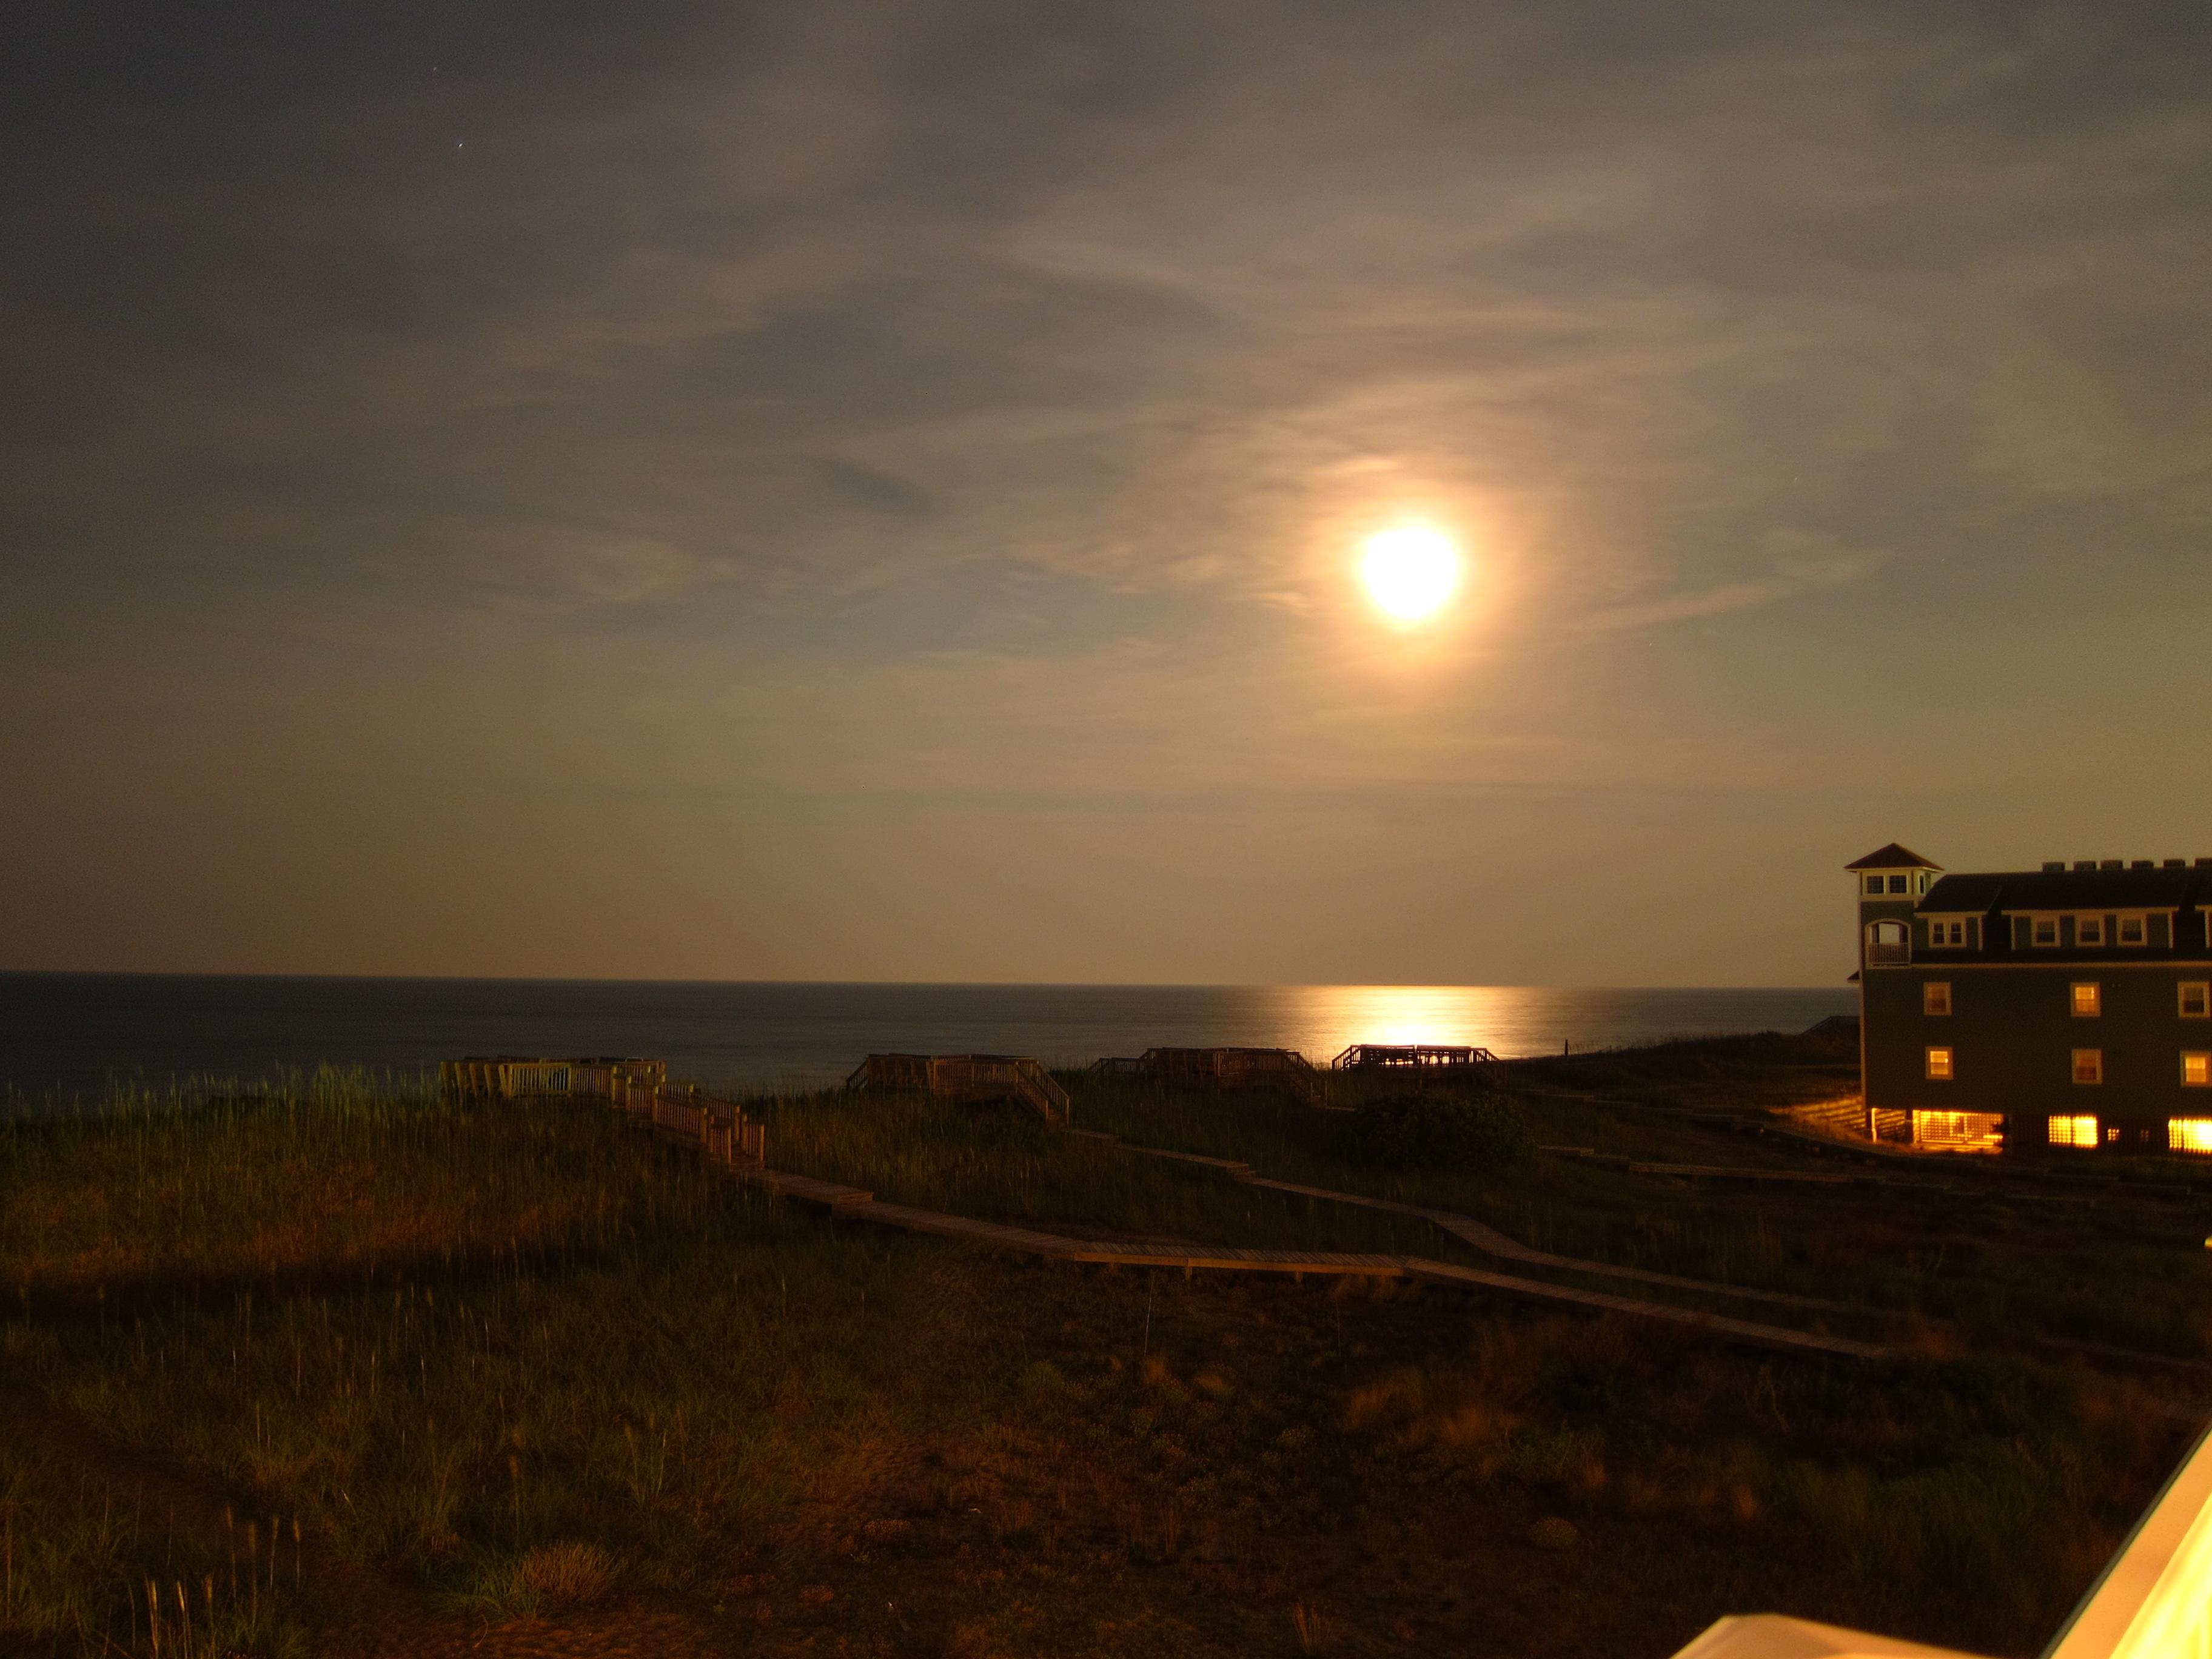 Moonlit night, Beach, Moon, Moonlight, Night, HQ Photo